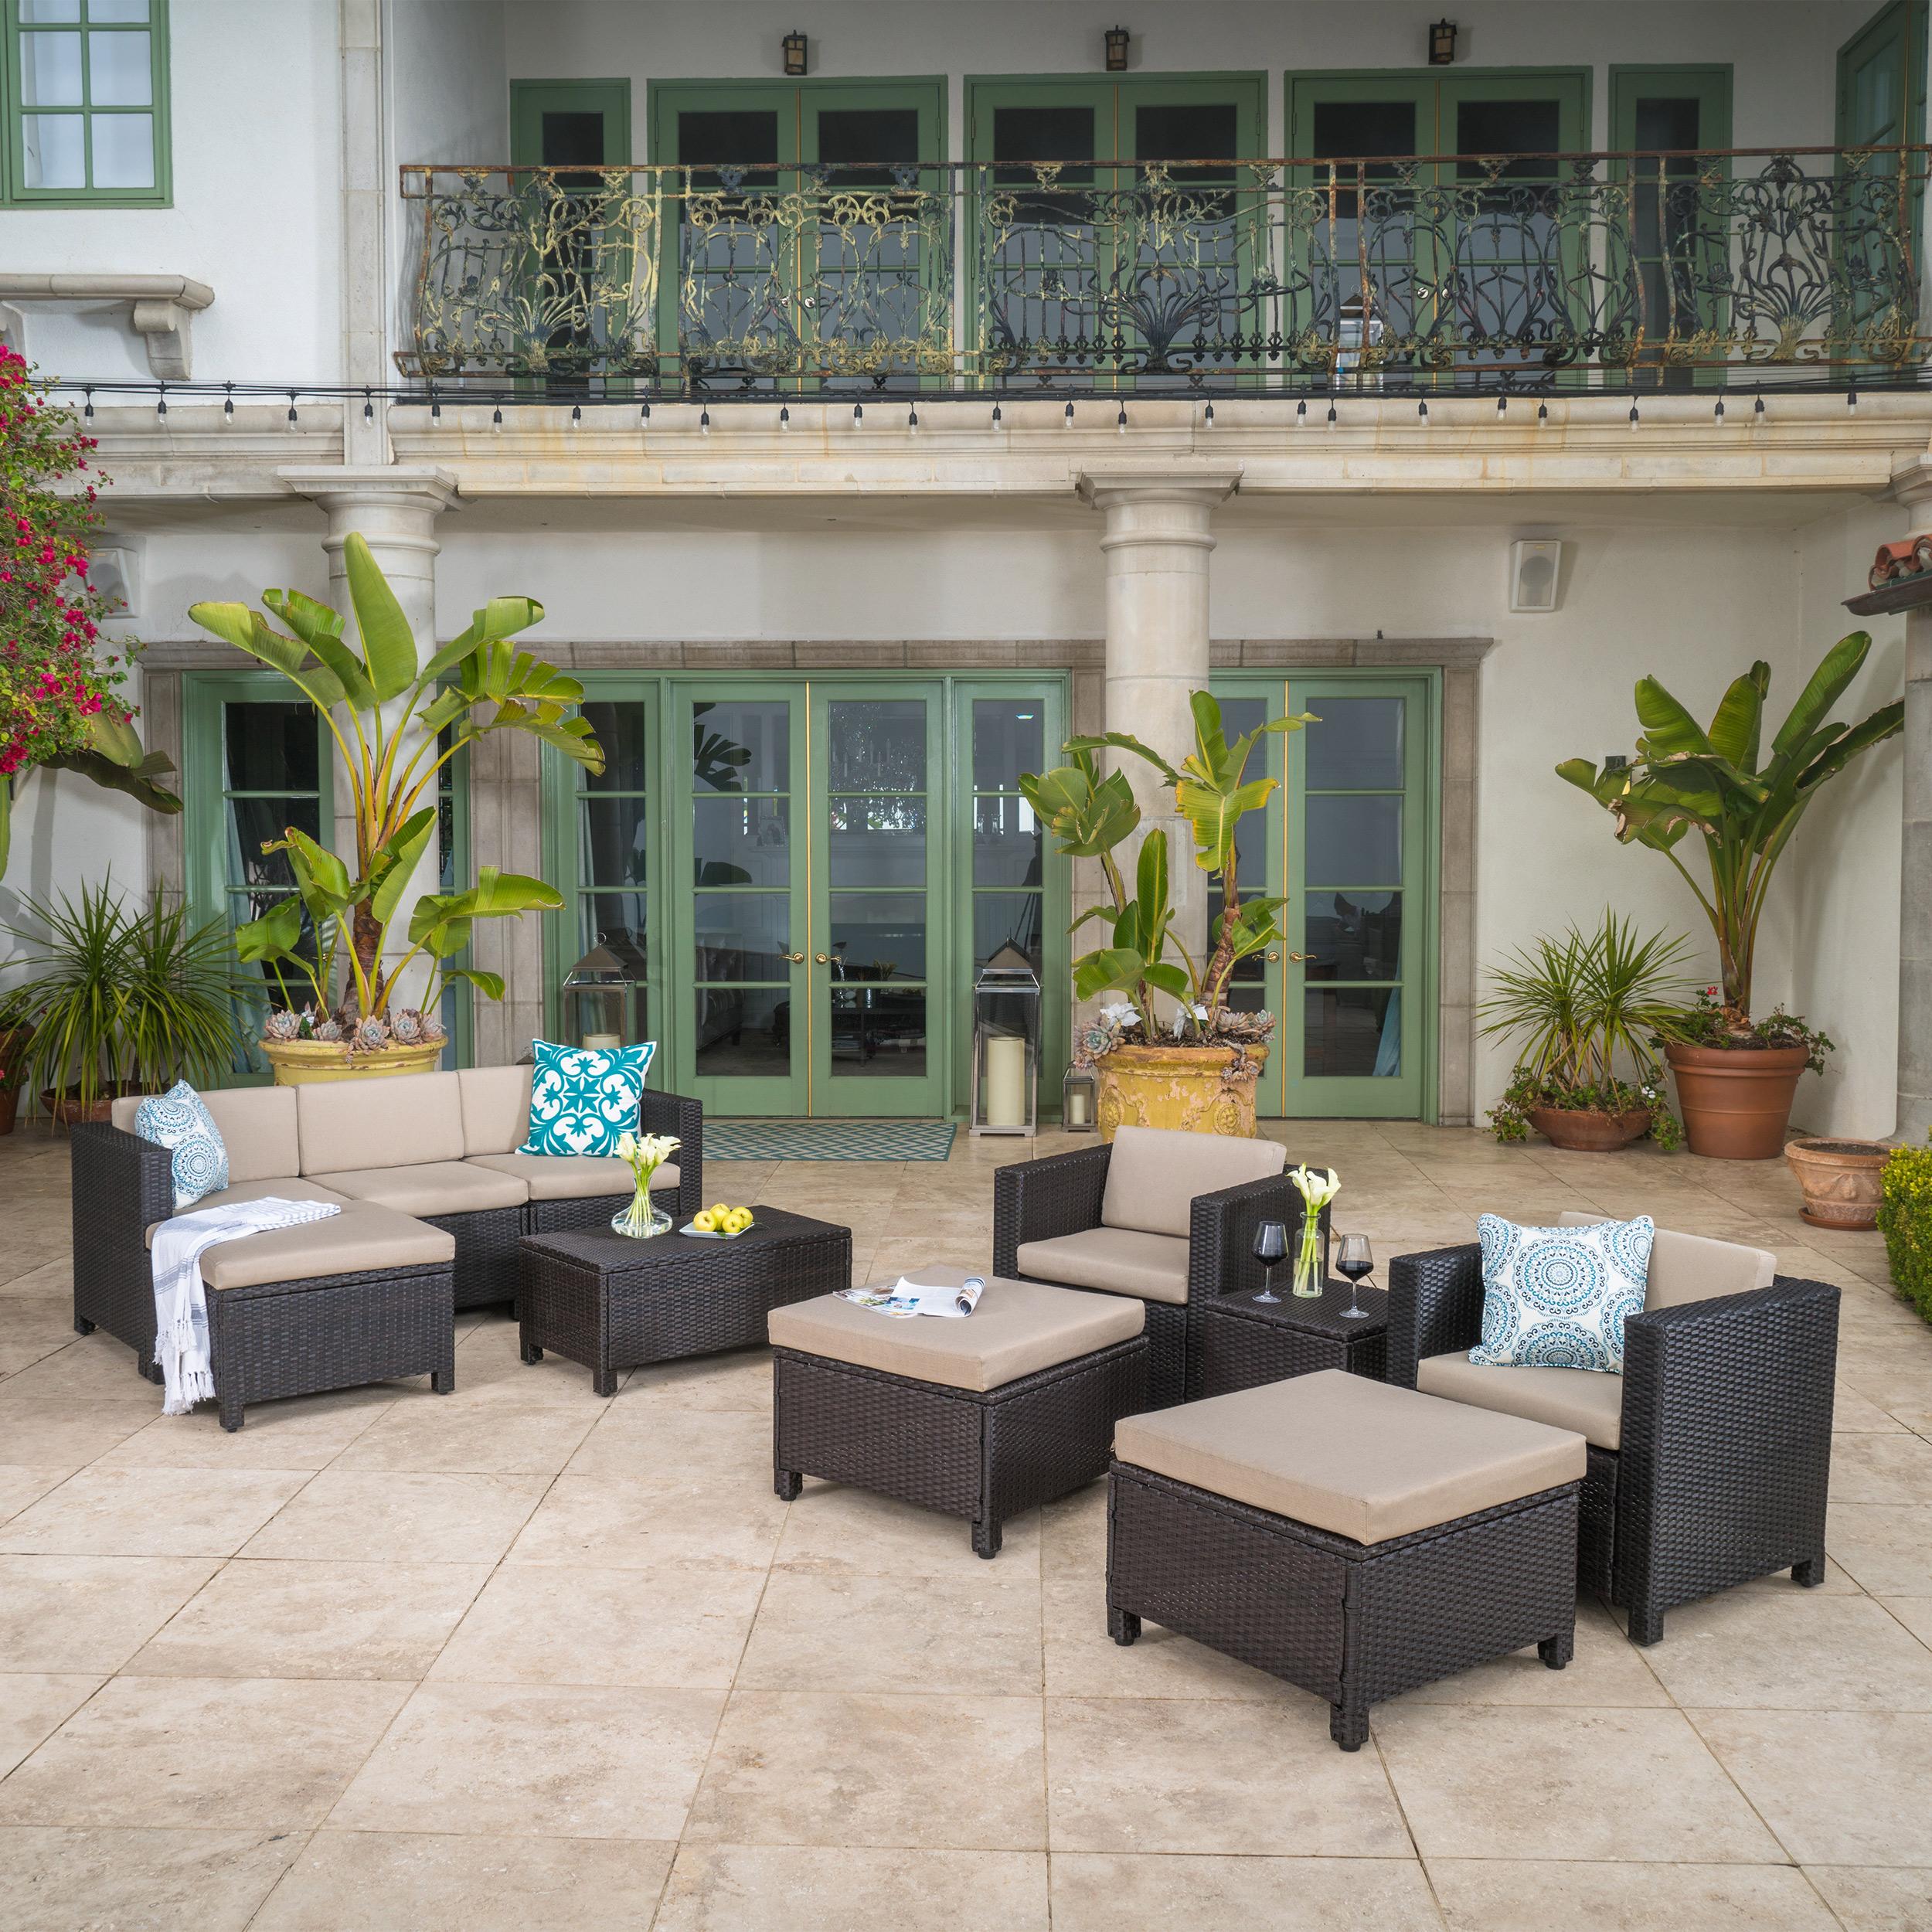 Cascada Outdoor 10 Piece Wicker Sofa Collection with Cushions, Dark Brown, Beige